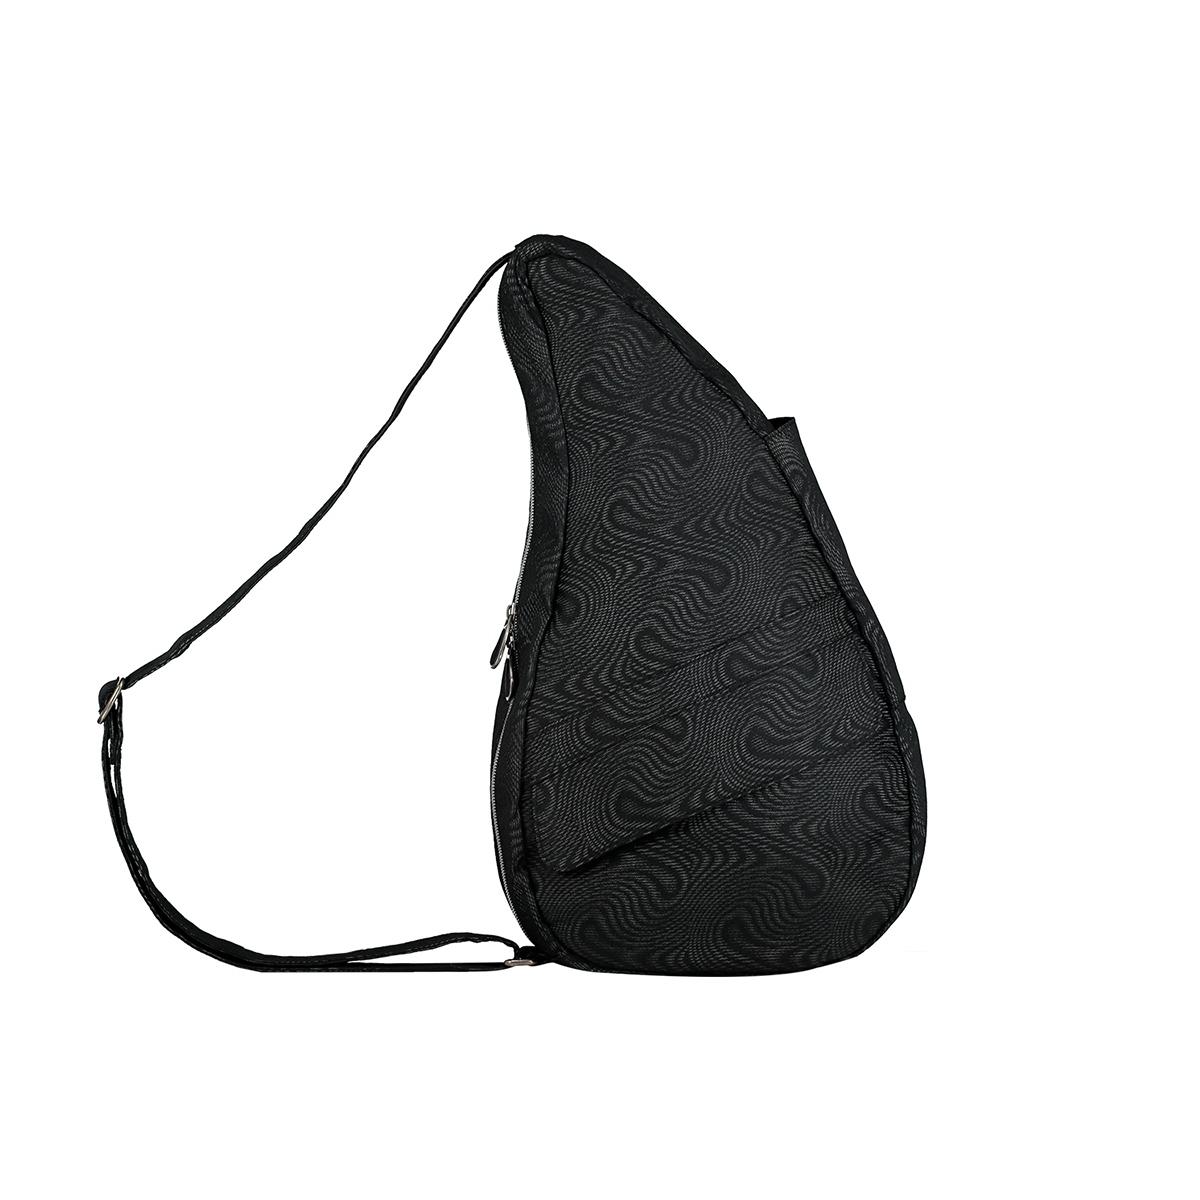 Healthy Back Bag/ヘルシーバックバッグ/ショルダーバッグ/ボディバッグ/旅行バッグ/軽量/レディース/メンズ 《限定ポーチ付》 公式ストア ヘルシーバックバッグ モアレ Sサイズ ブラック